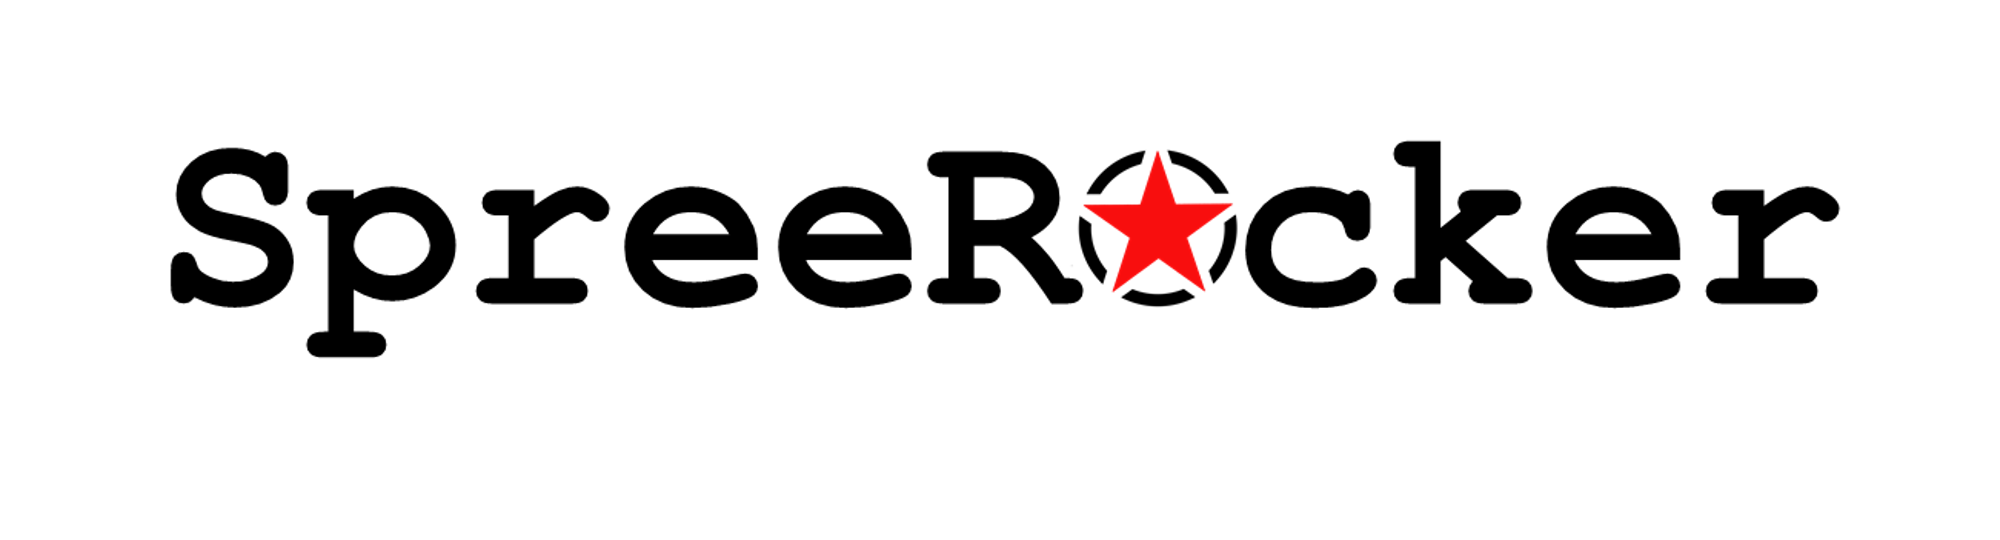 SpreeRocker Logo